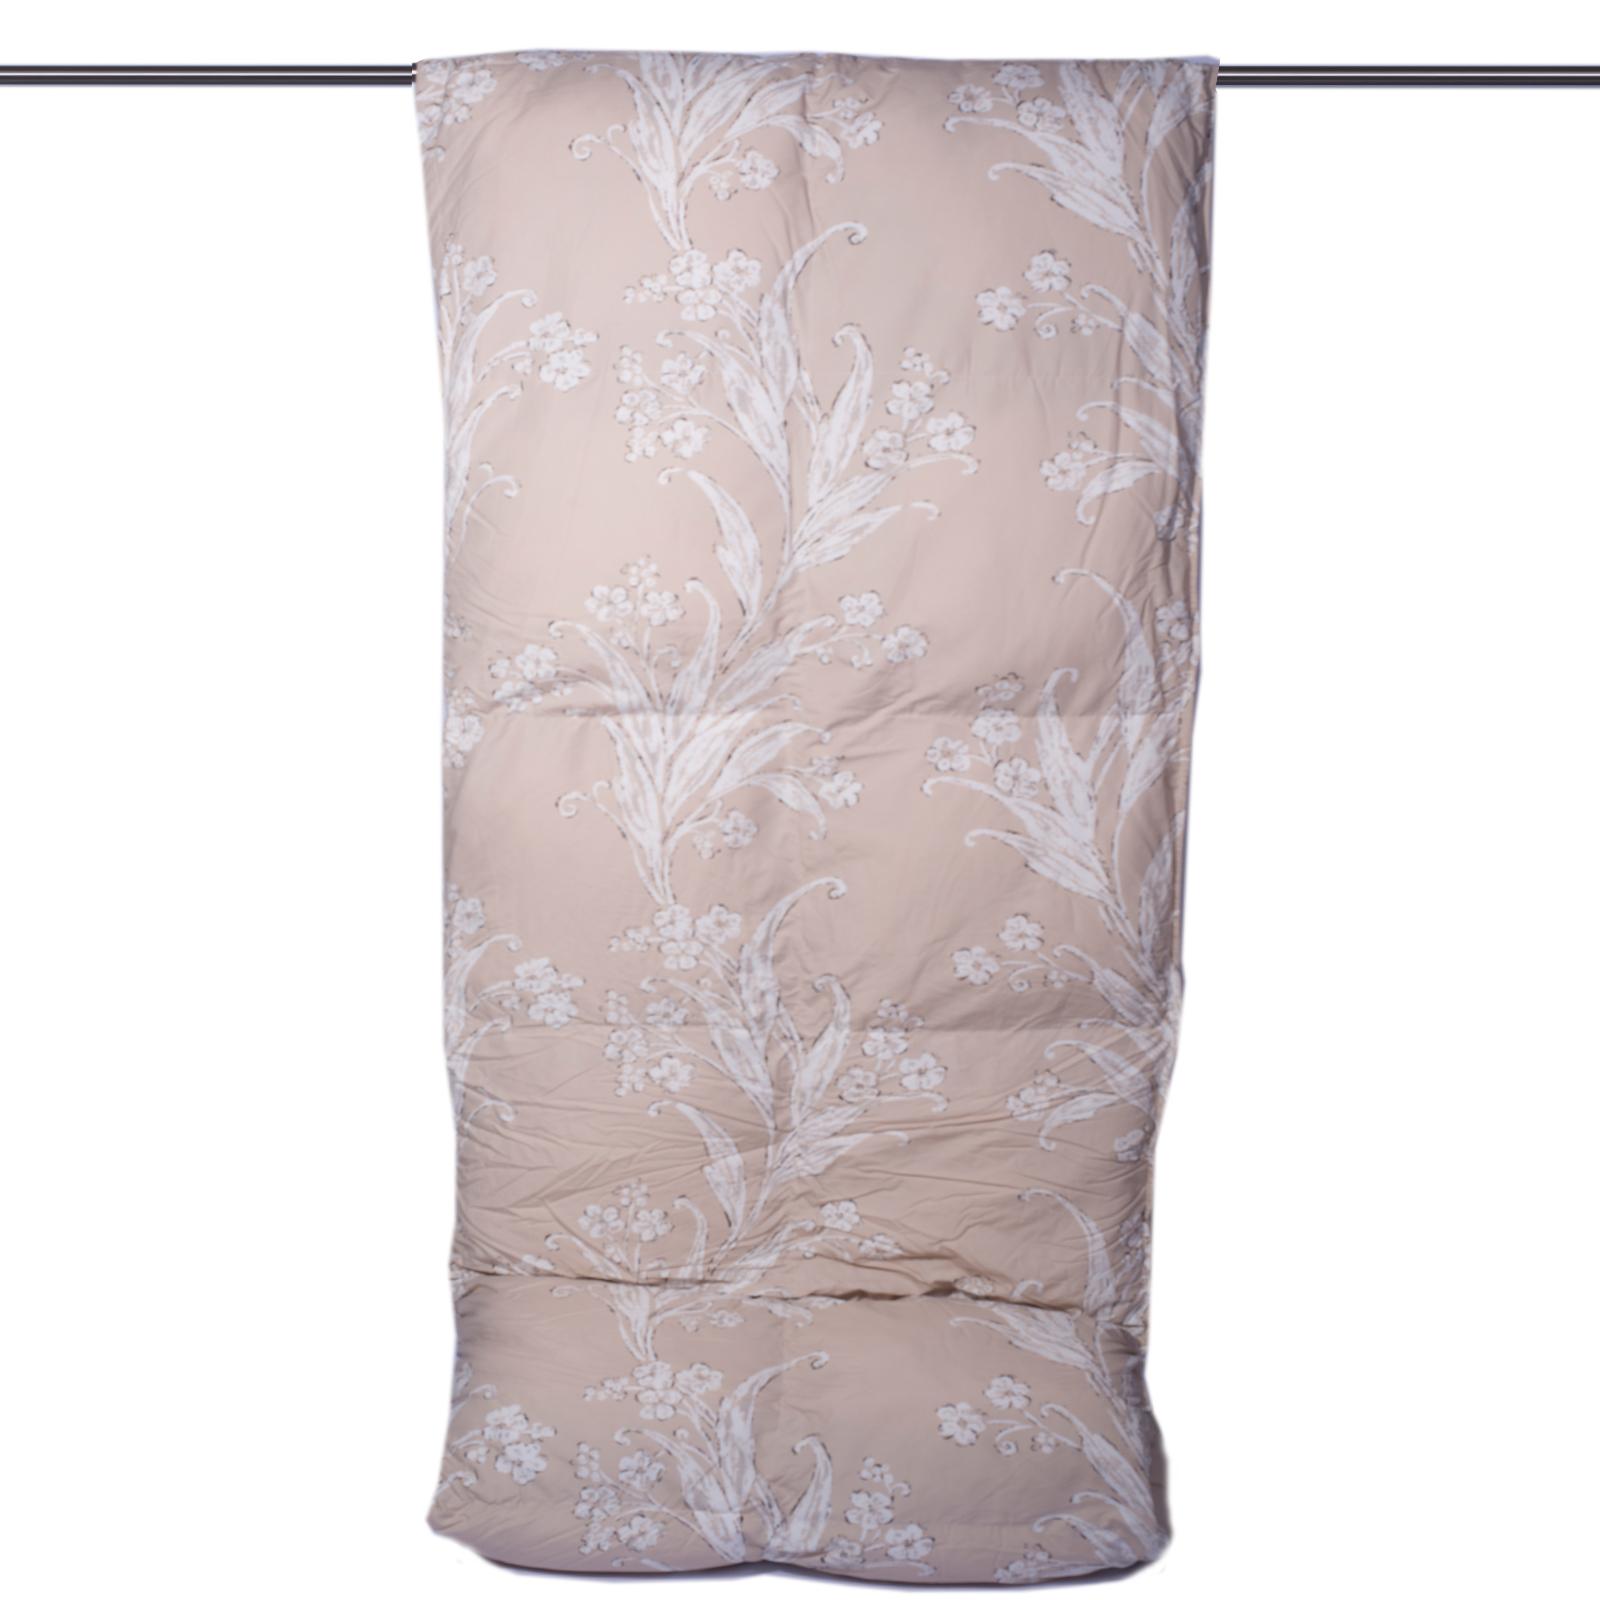 Trapunta softy anallergica piccarda cose di casa un - Tende per doccia rigide ...